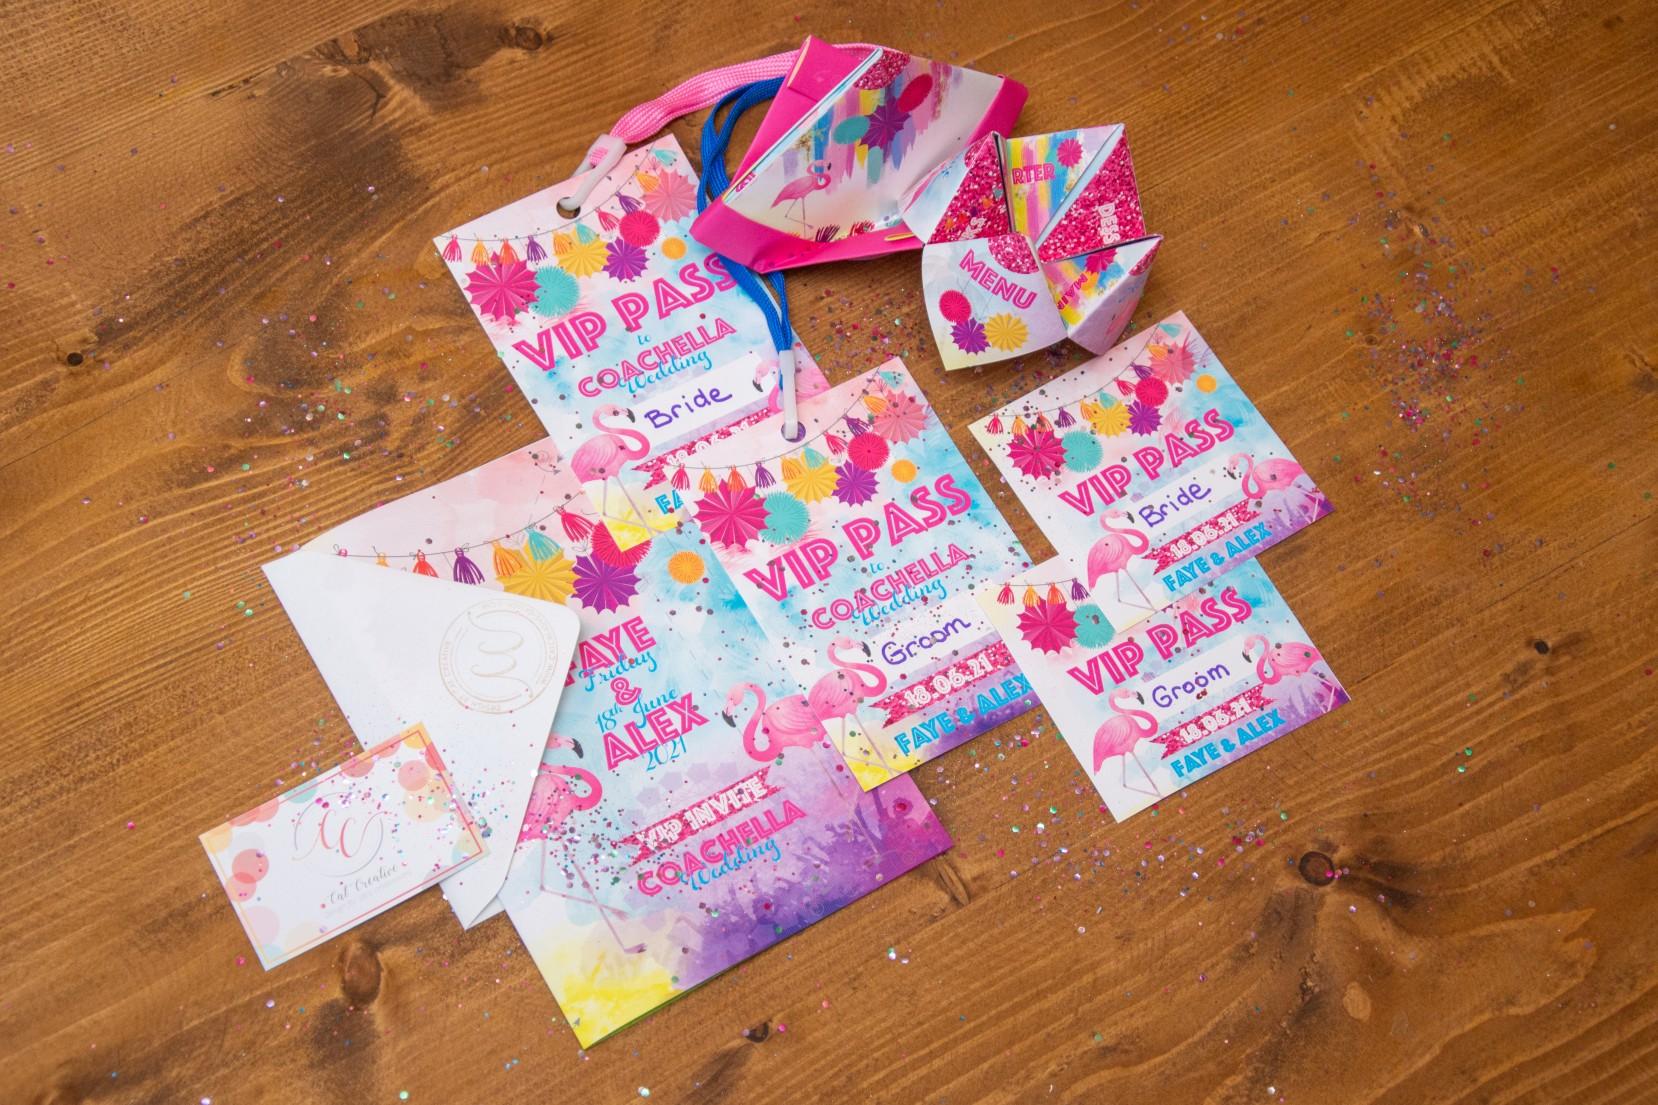 festival wedding stationery - vip pass wedding stationery - festival wedding ideas - colourful festival wedding - fun wedding stationery